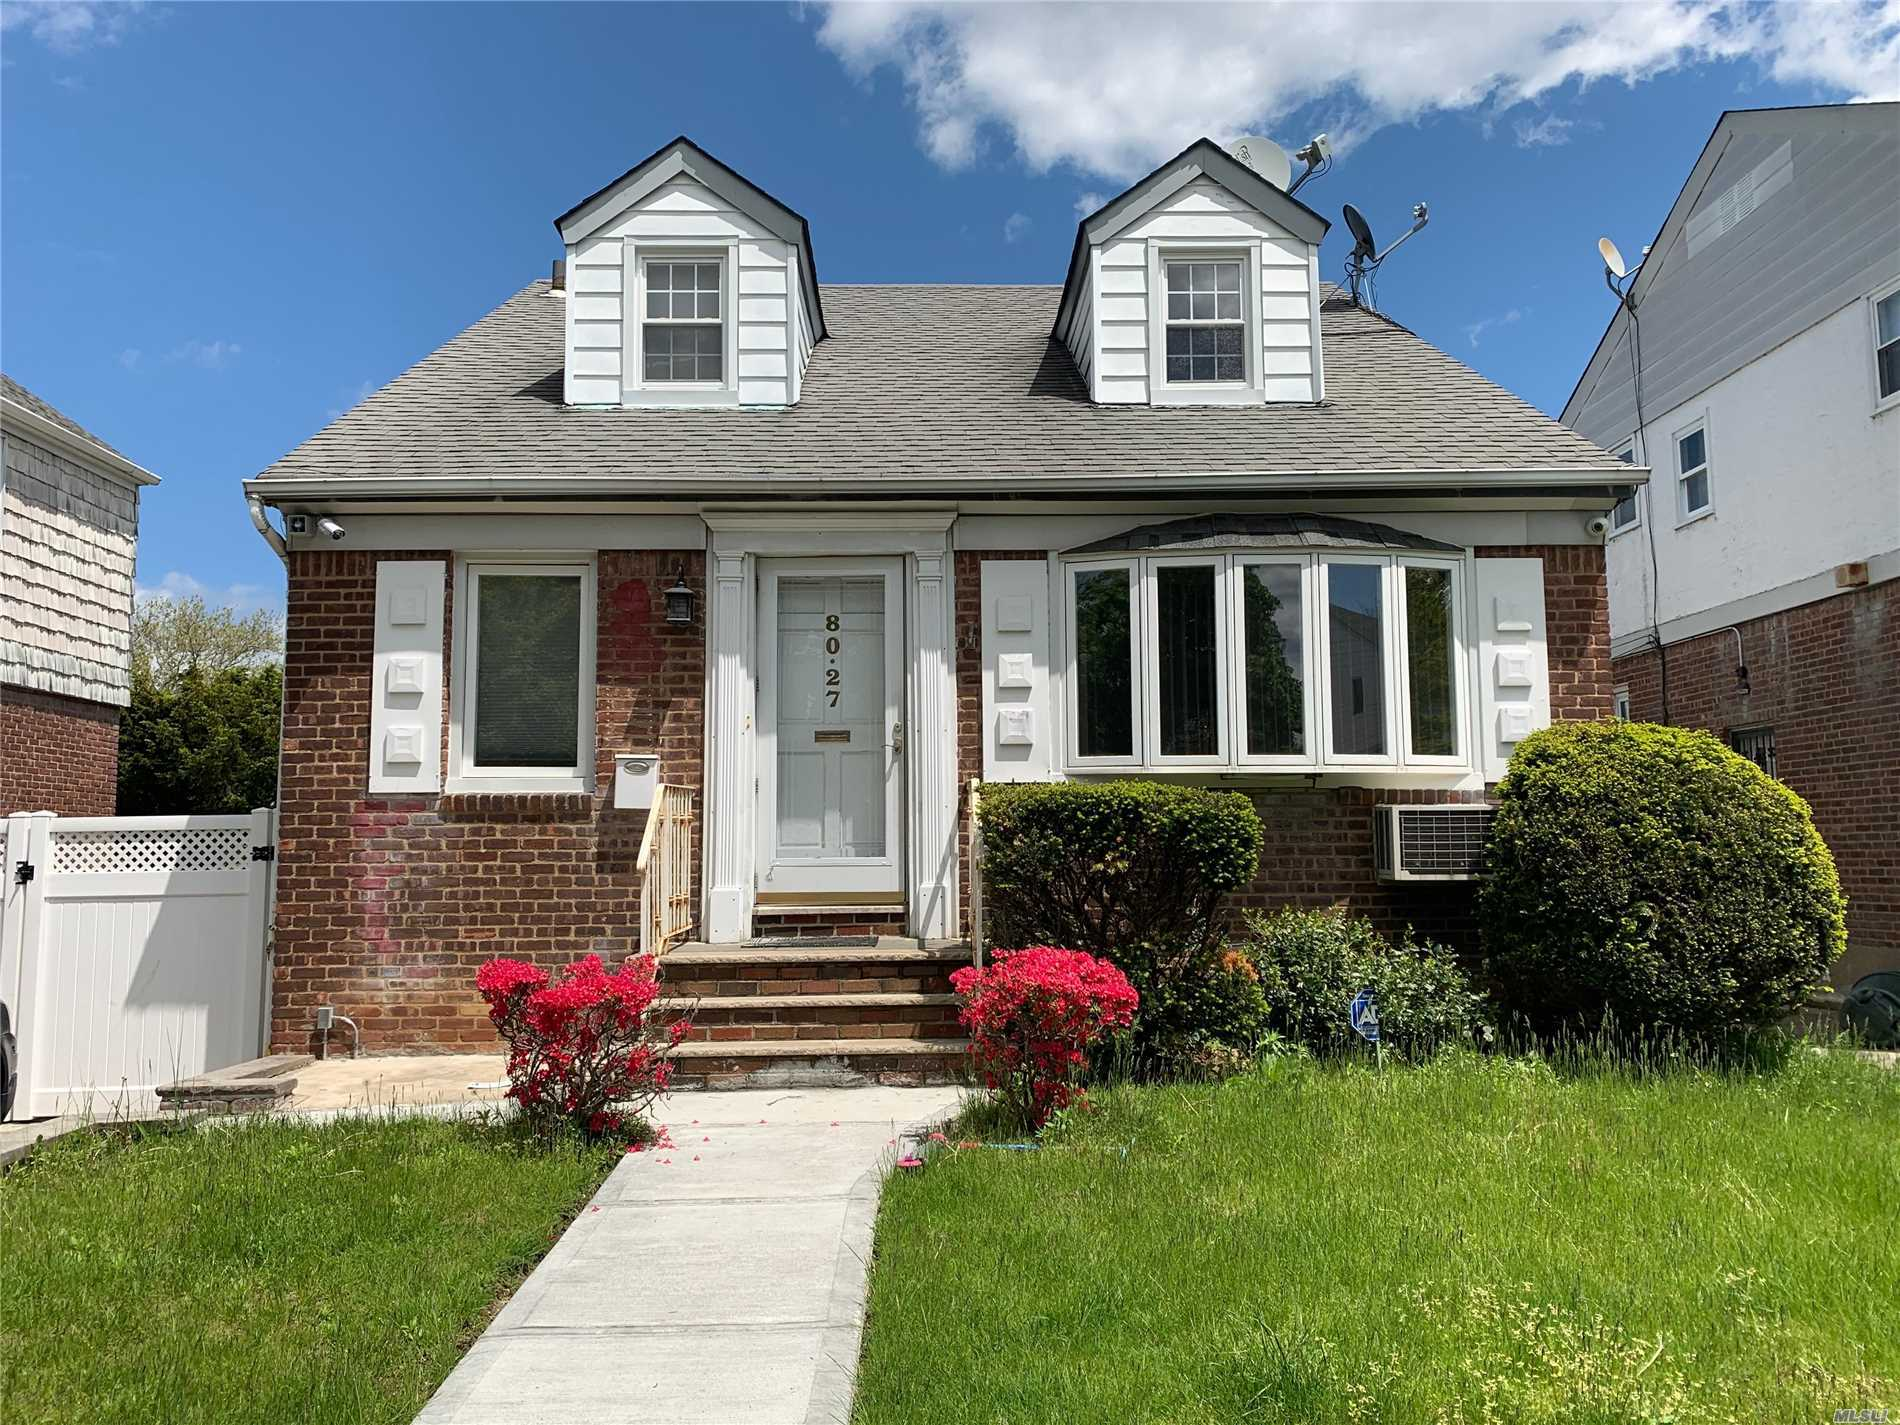 80-27 213 St Hollis Hills, NY 11427